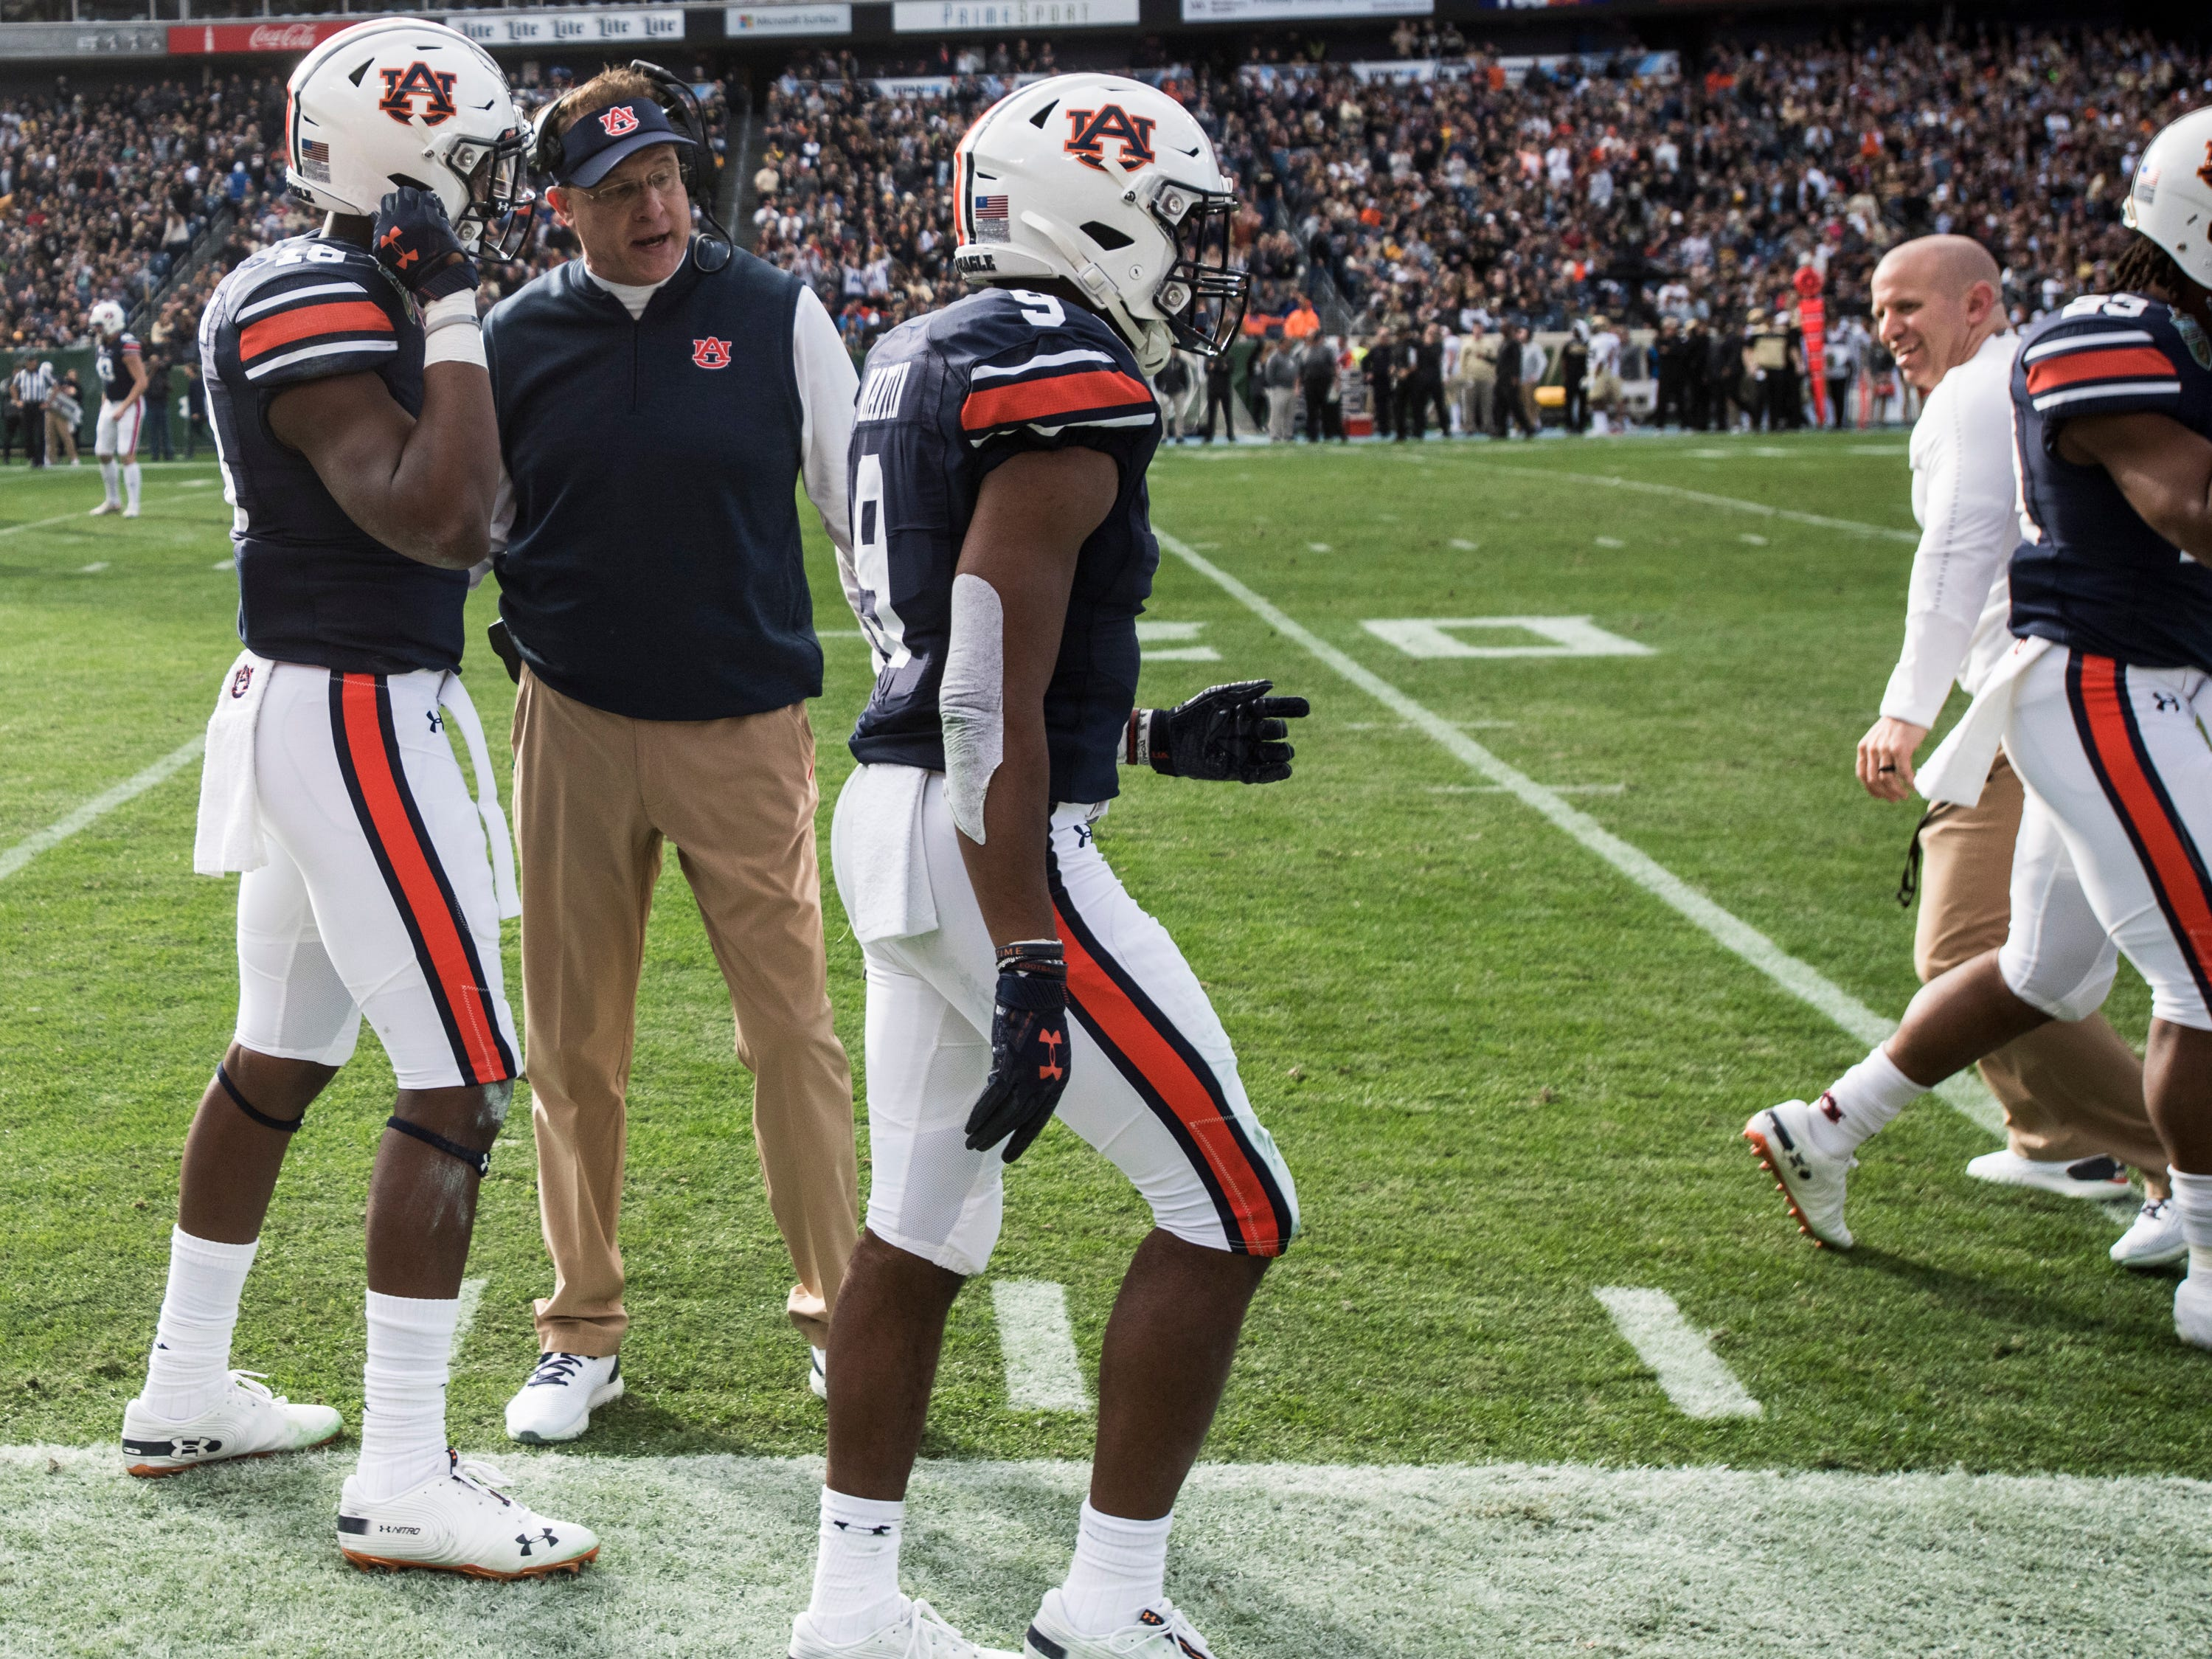 Auburn head coach Gus Malzahn talks with Auburn wide receiver Seth Williams (18) after a touchdown during the Music City Bowl at Nissan Stadium in Nashville, Tenn., on Friday, Dec. 28, 2018. Auburn leads Purdue 56-7 at halftime.